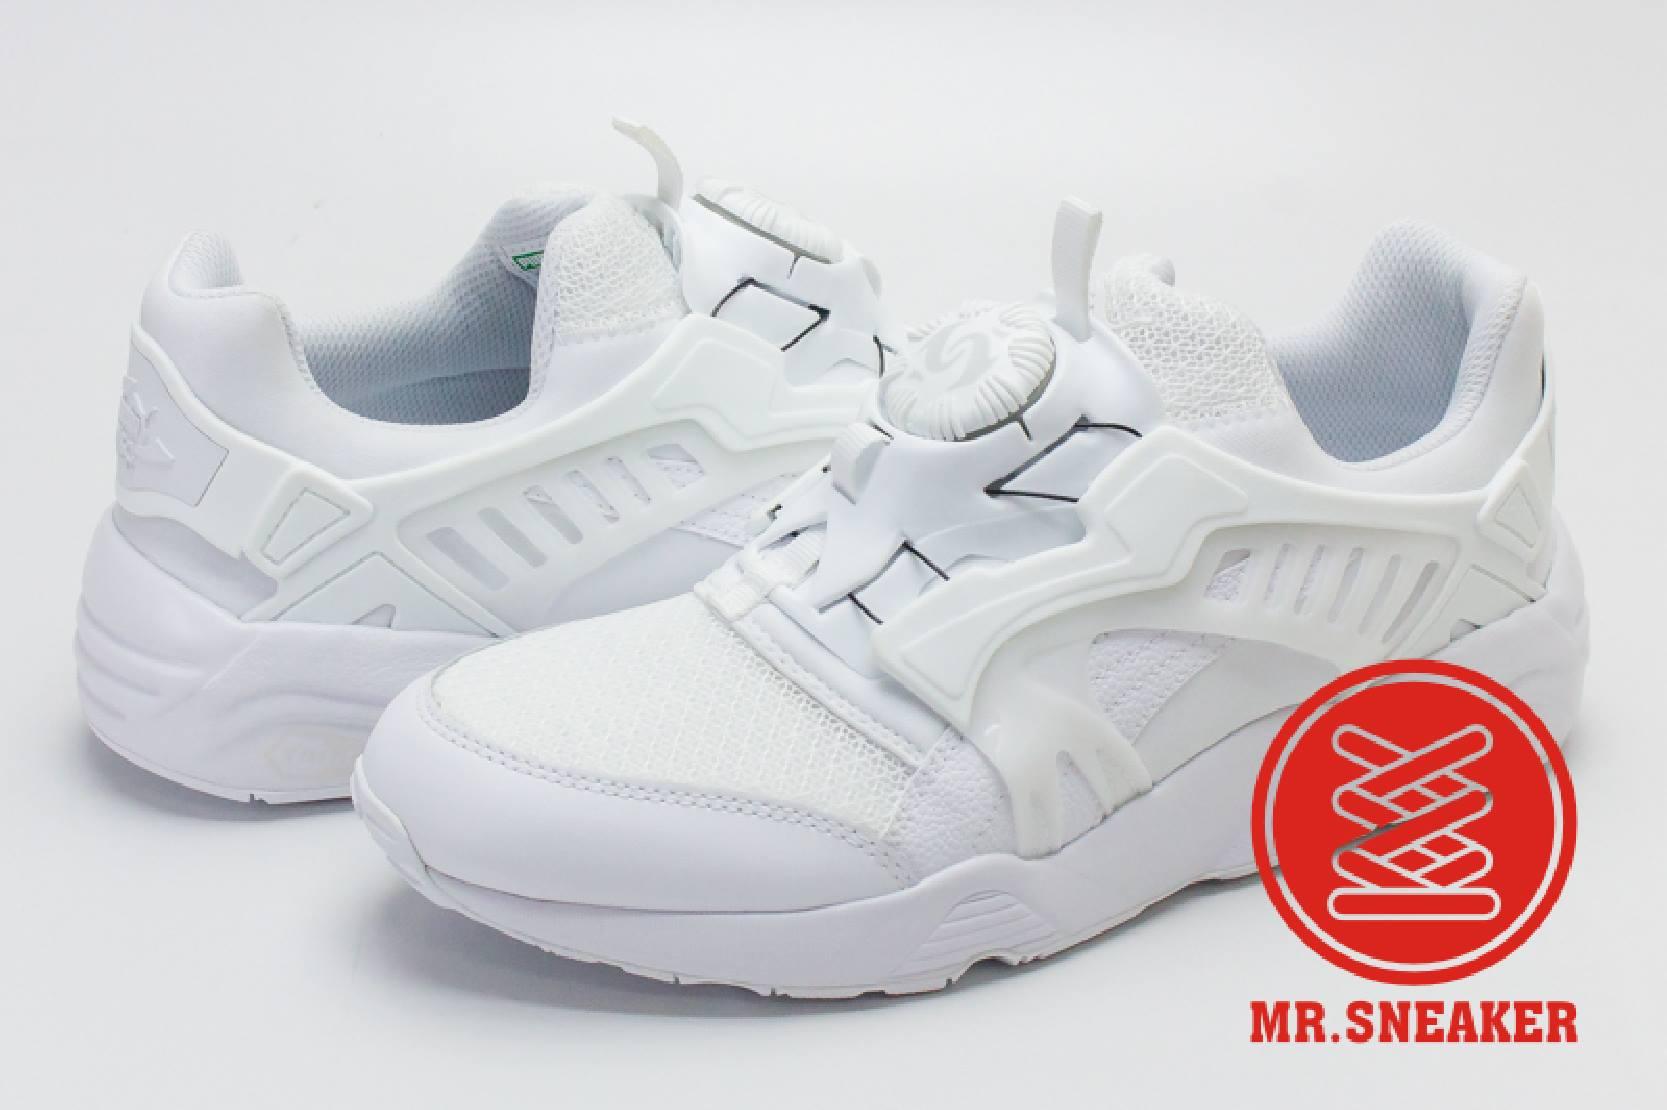 ☆Mr.Sneaker☆ Puma Disc Blaze Trinomic CT 轉盤 非武士鞋 後提把 蜂巢避震 男女段 白